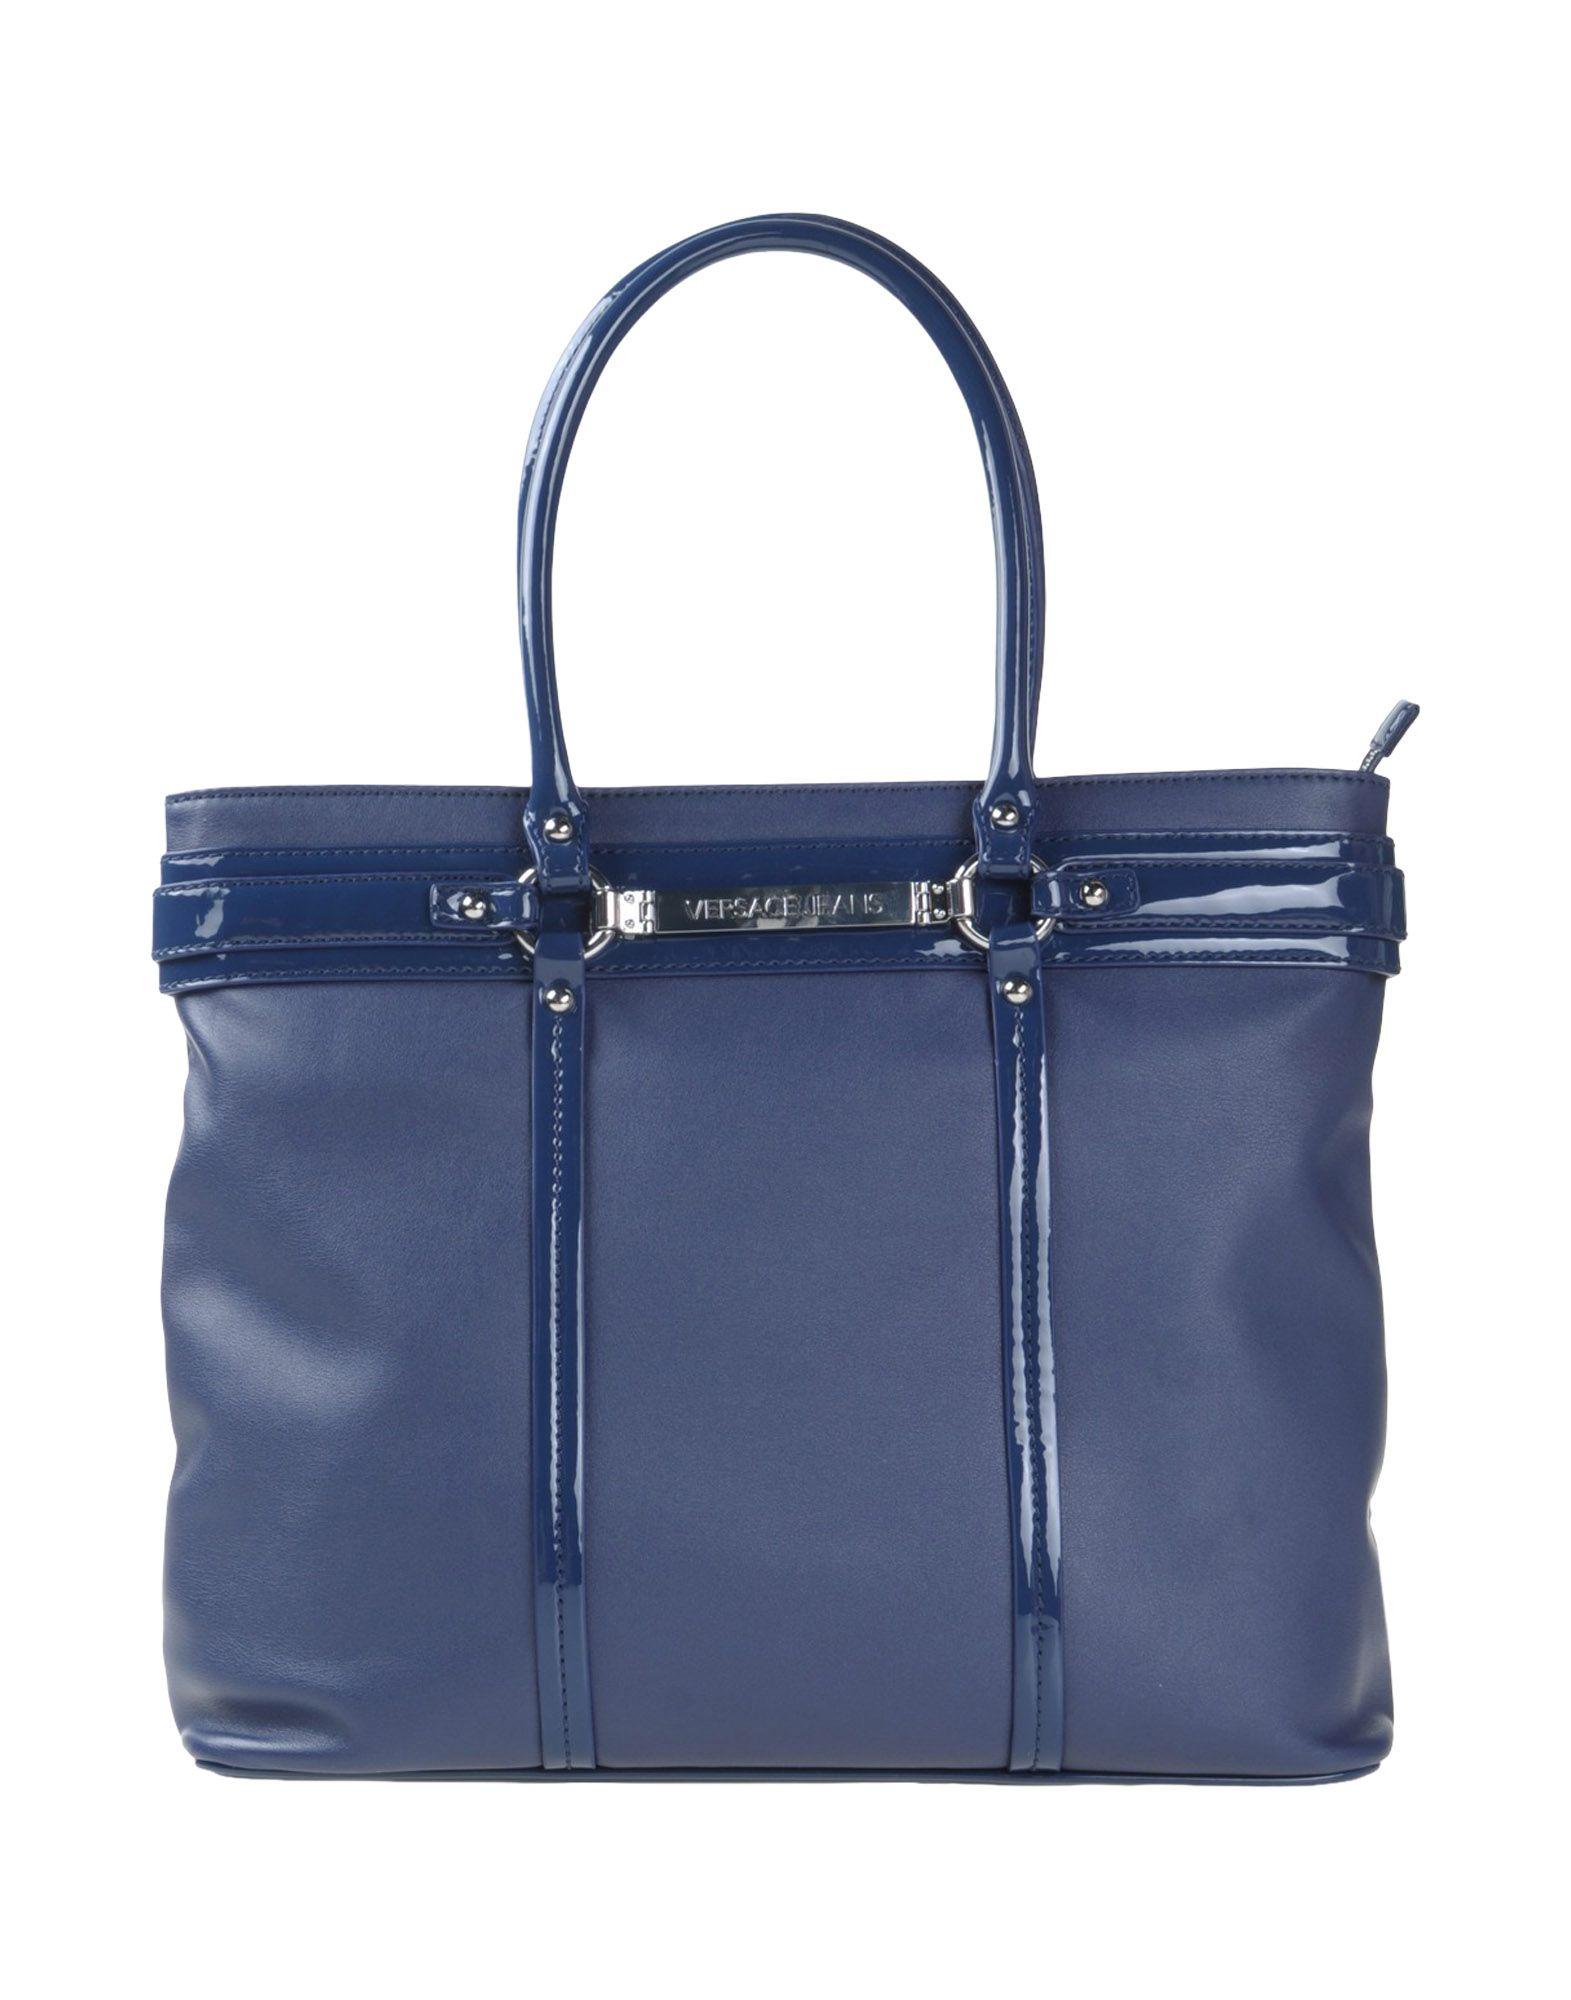 Versace jeans Handbag in Blue (Dark blue)